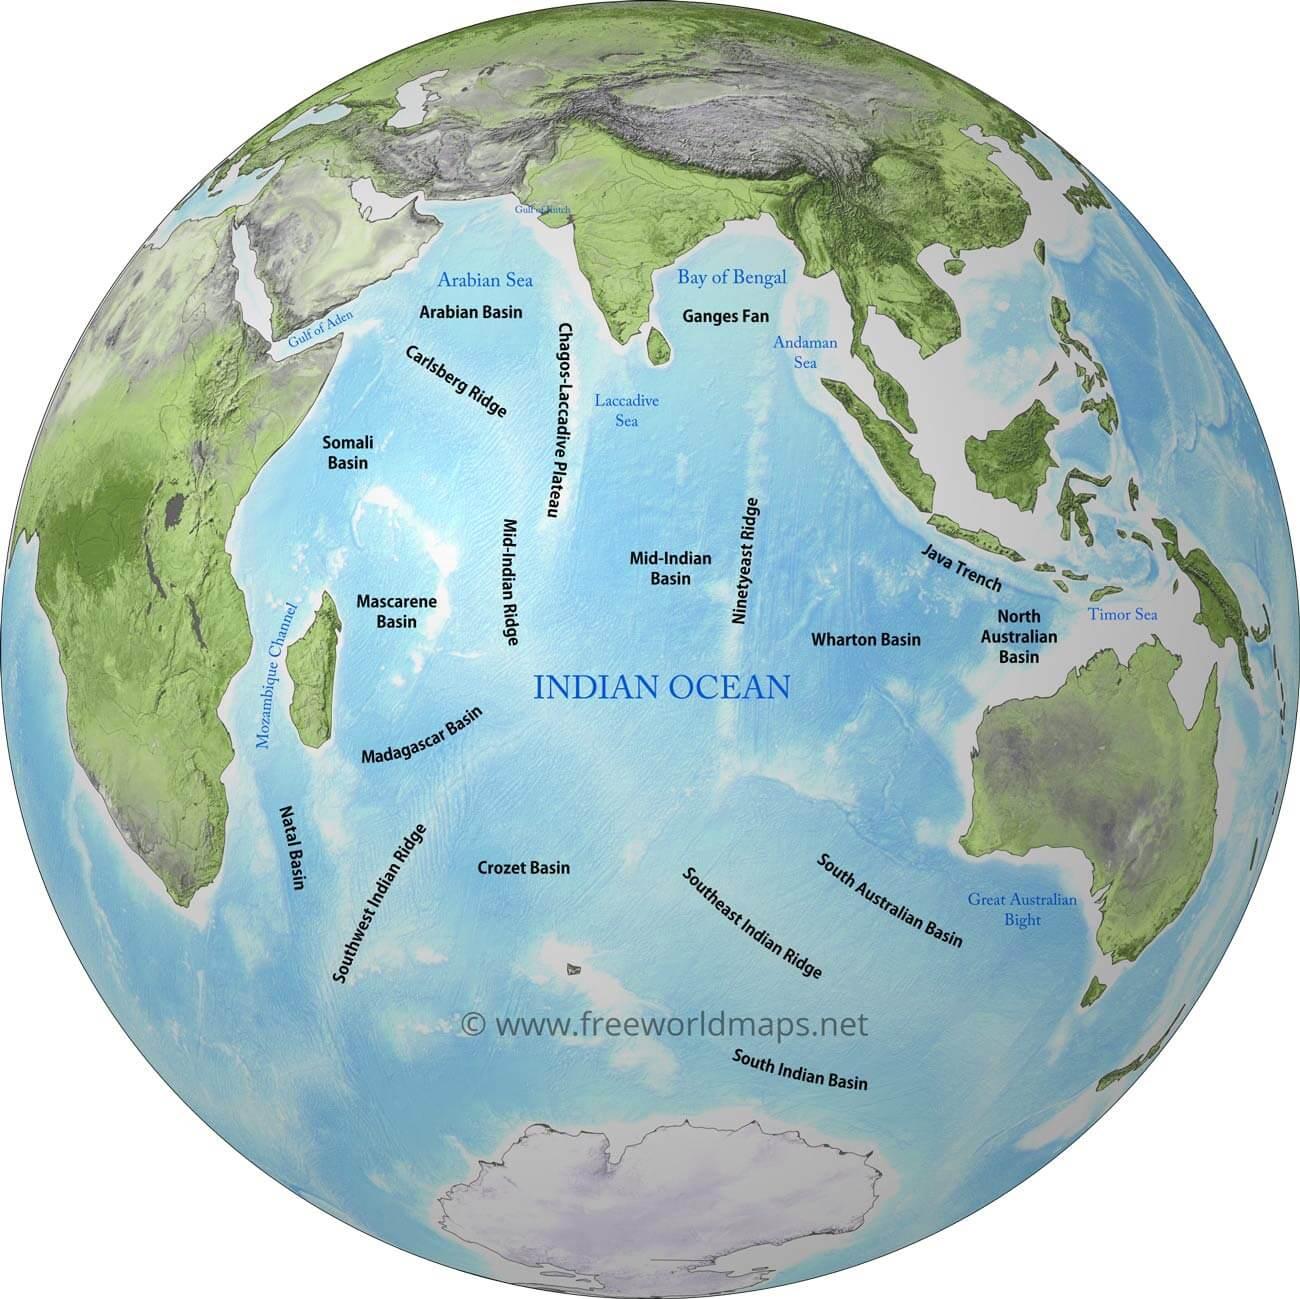 Geography and Map of the Indian Ocean on indian port map, caspian sea, persian gulf, atlantic ocean, bay of bengal, mediterranean sea, indian continent map, christmas island, arctic ocean, indian peaks map, southern ocean, indian airport map, indian peninsula map, indian war map, indian desert map, caribbean sea, silk road, pacific ocean, black sea, arabian sea, indian rivers map, indian mountains map, indian island map, indian heaven map, world ocean, indian staircase map, indian food map, south china sea, red sea, south asia, indian ocean map,